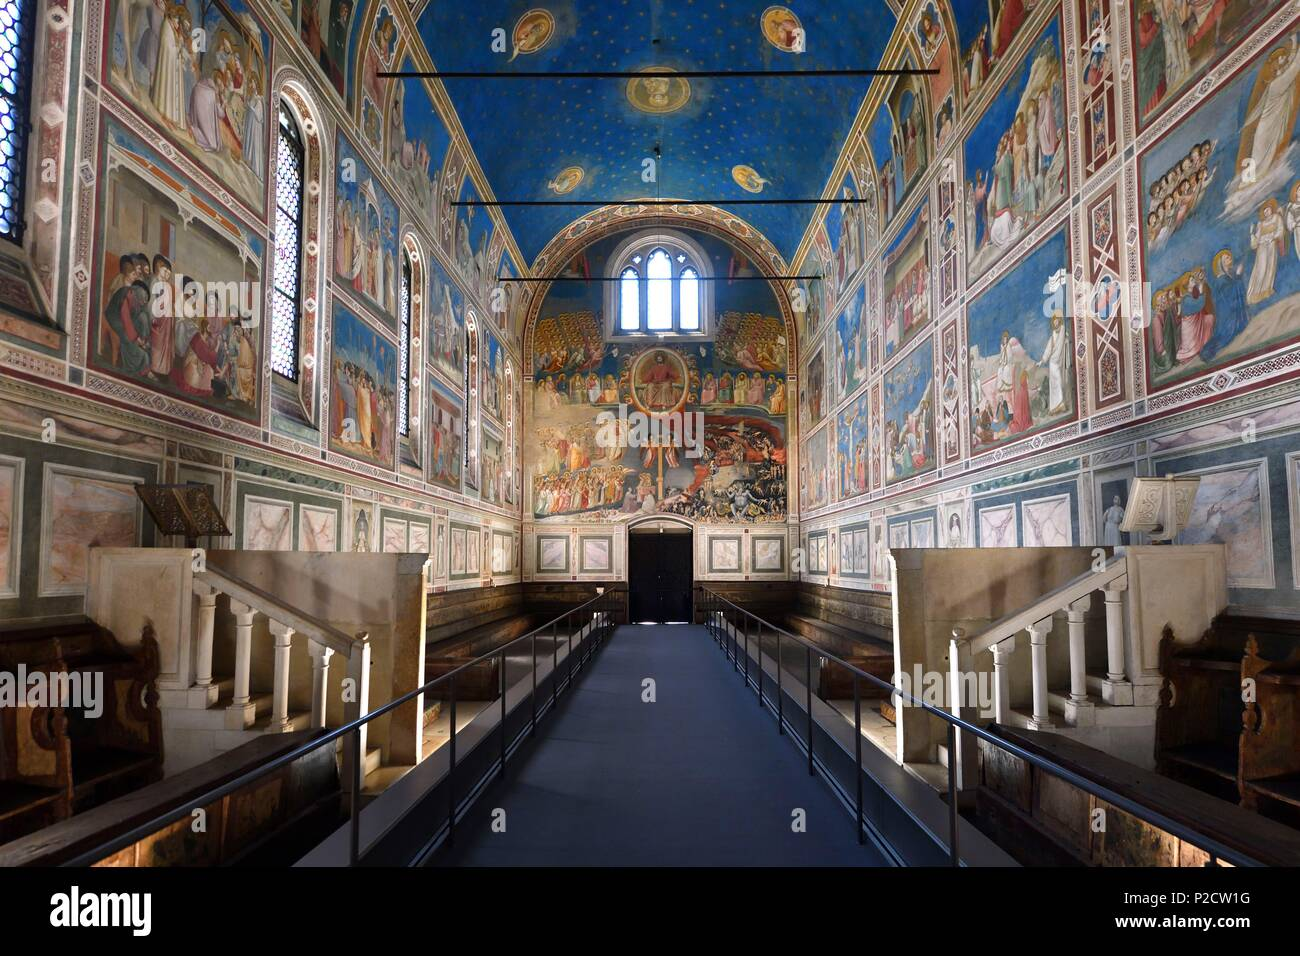 Italien Venetien Padua Padua Cappella Degli Scrovegni Kapelle